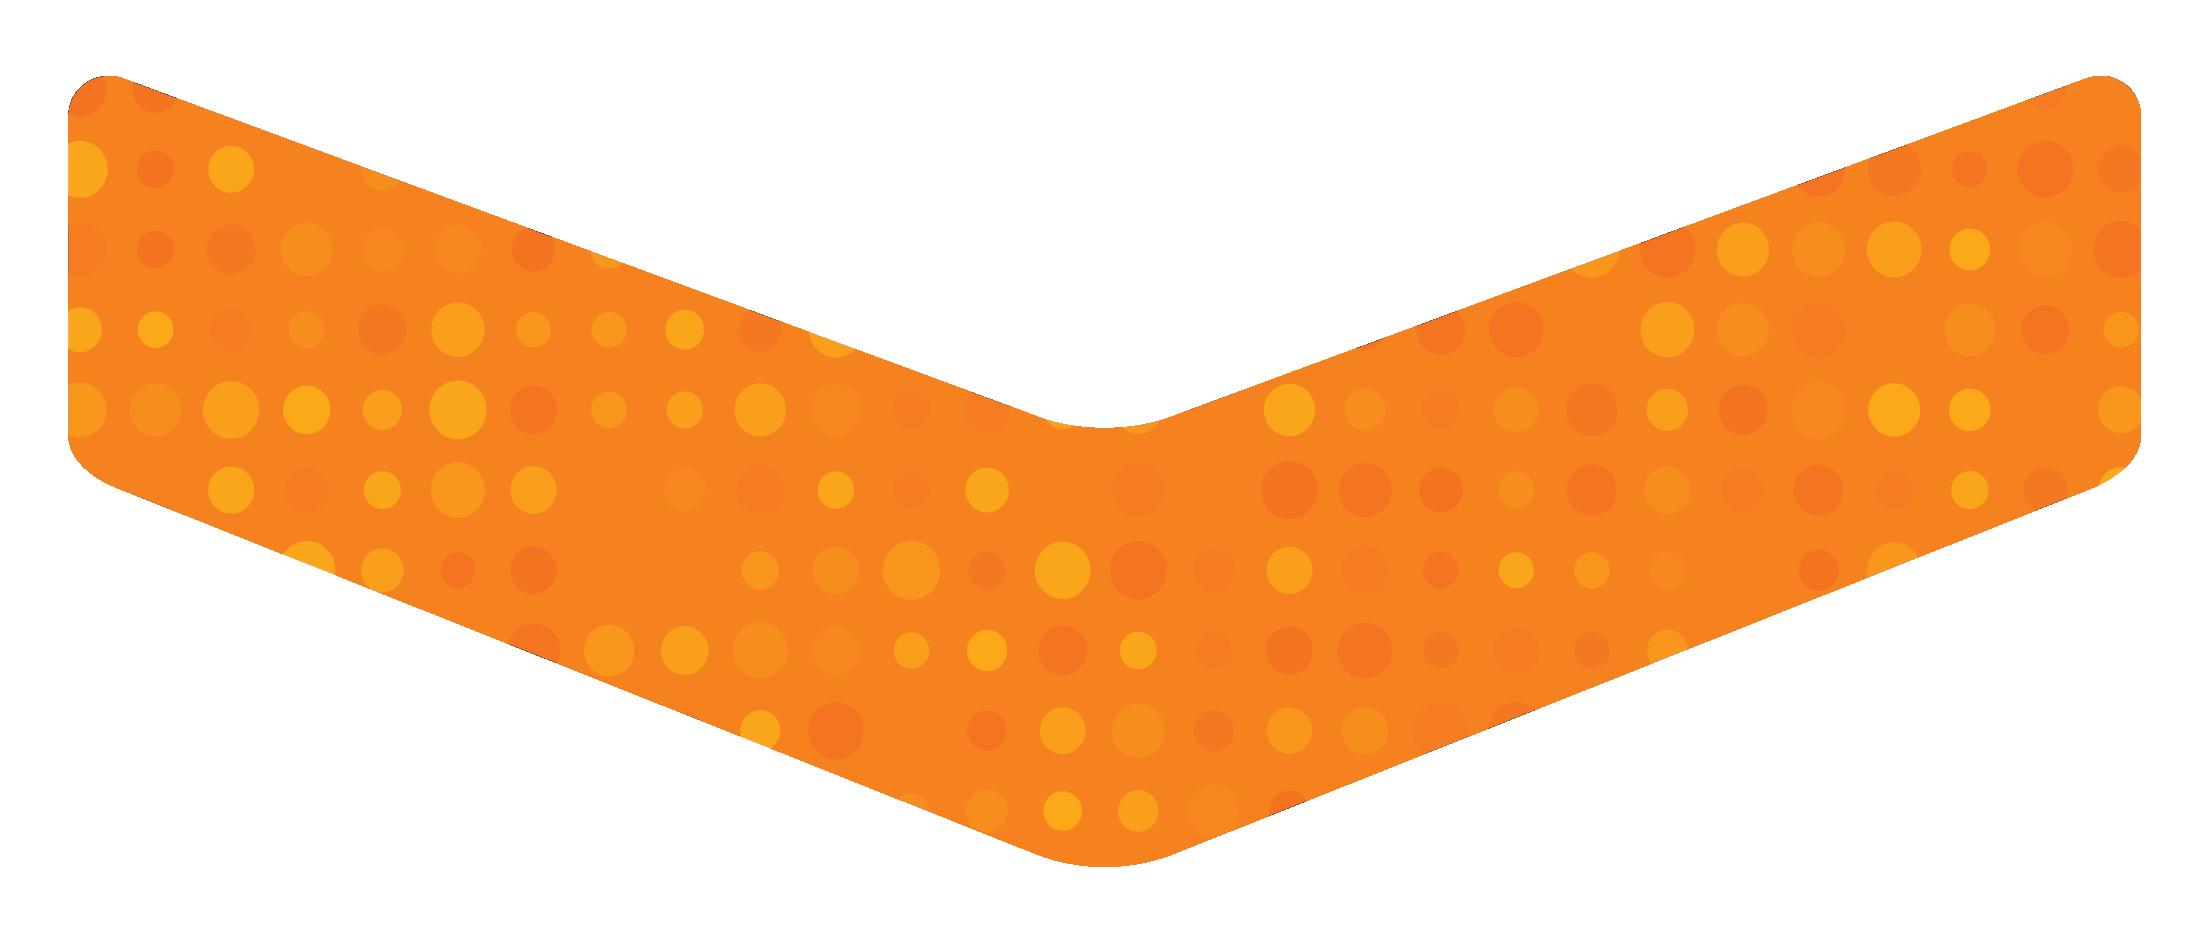 Arrow-graphics_Arrow - orange